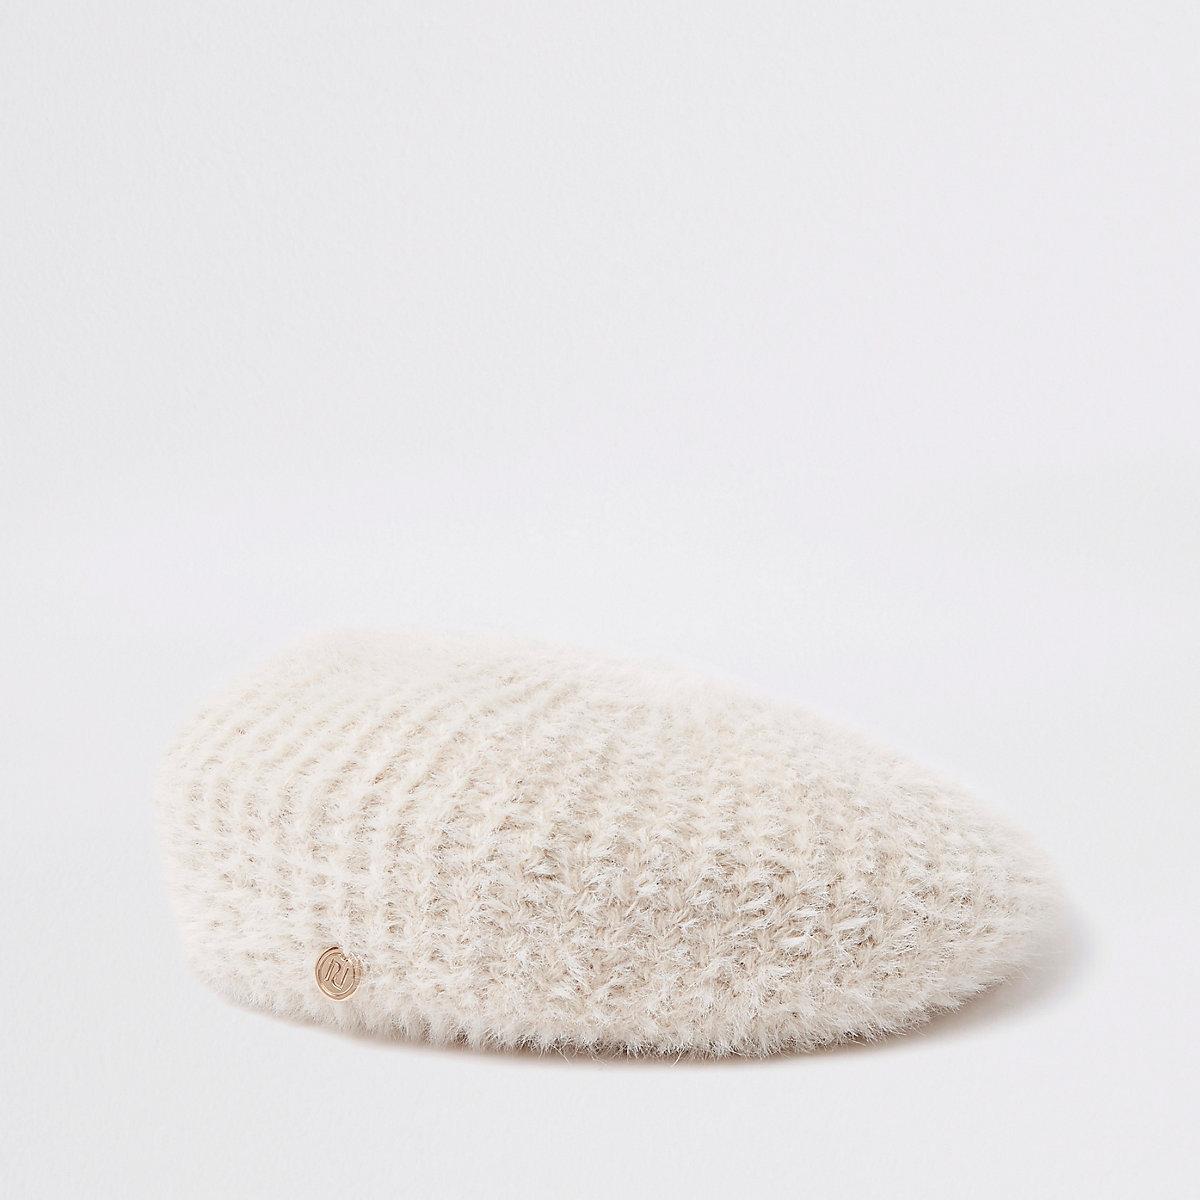 Beige fluffy beret